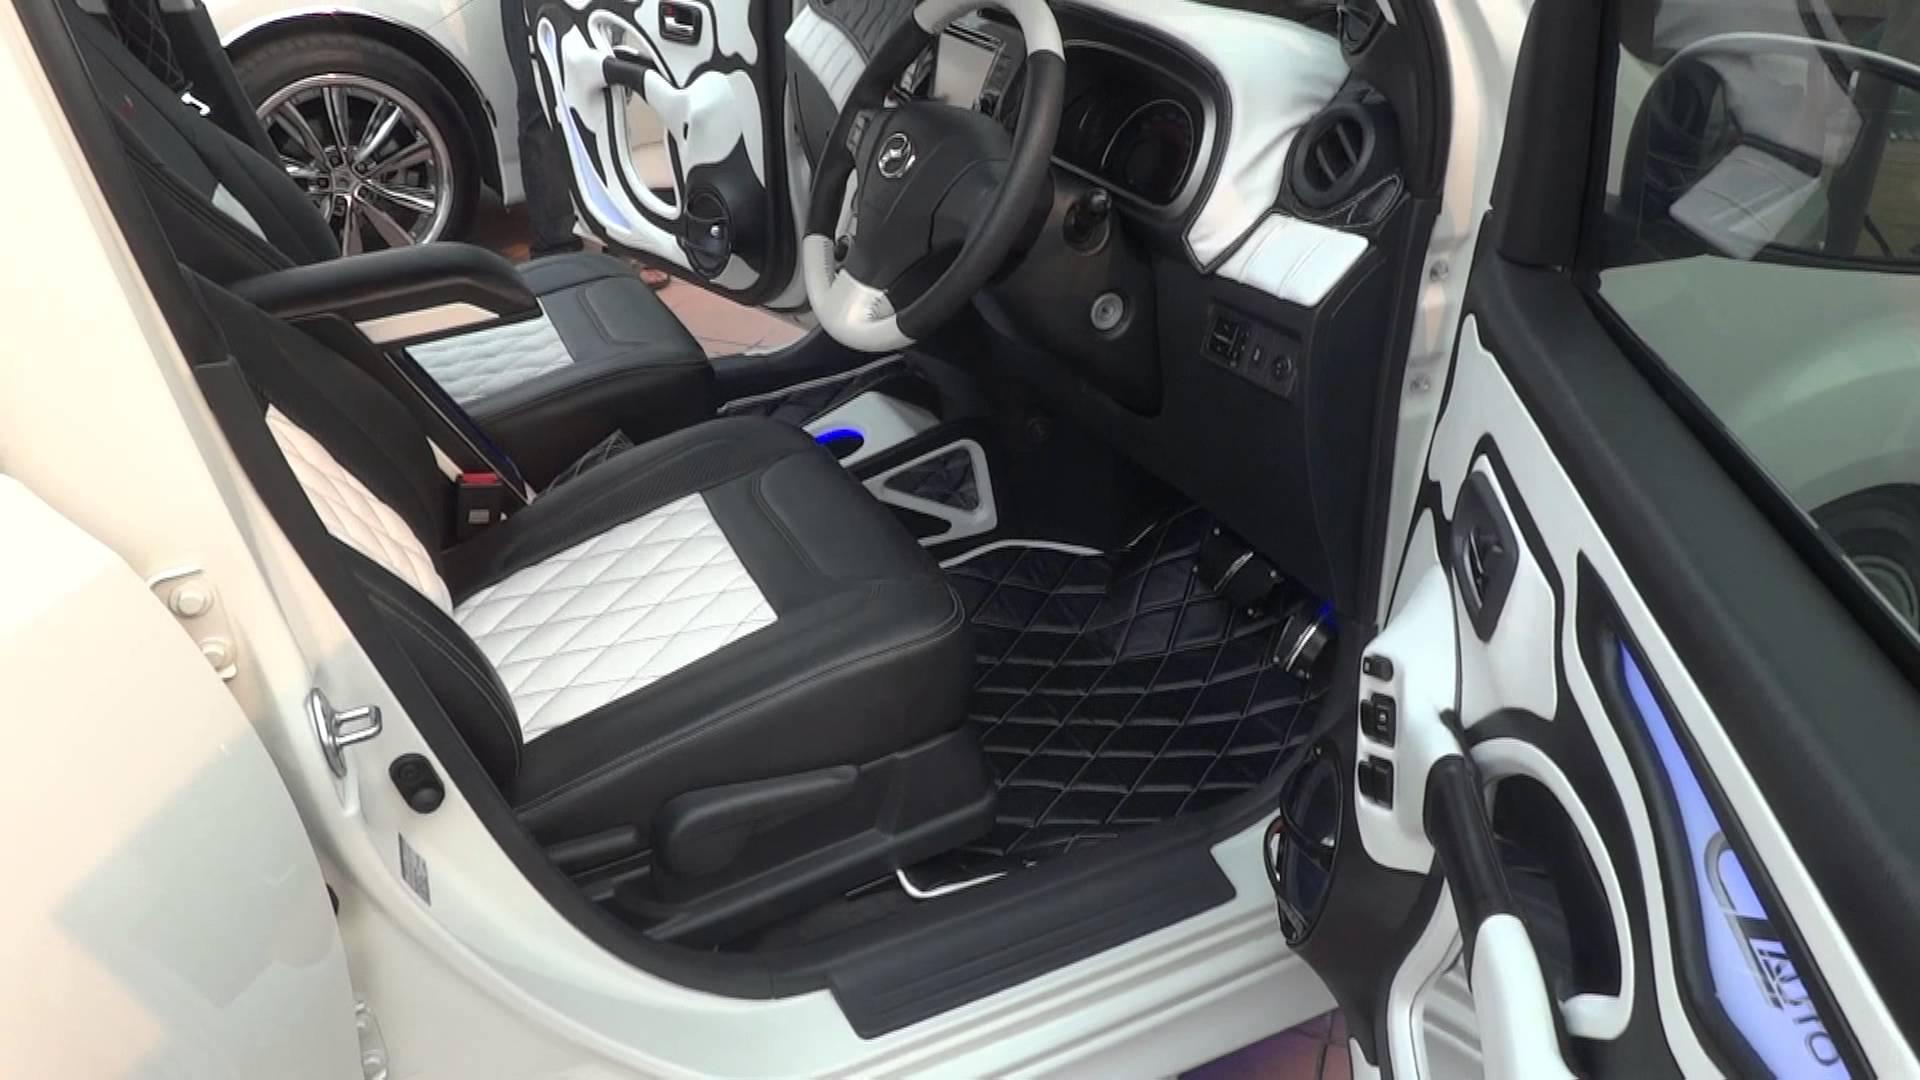 Black and White Car Interior - YouTube